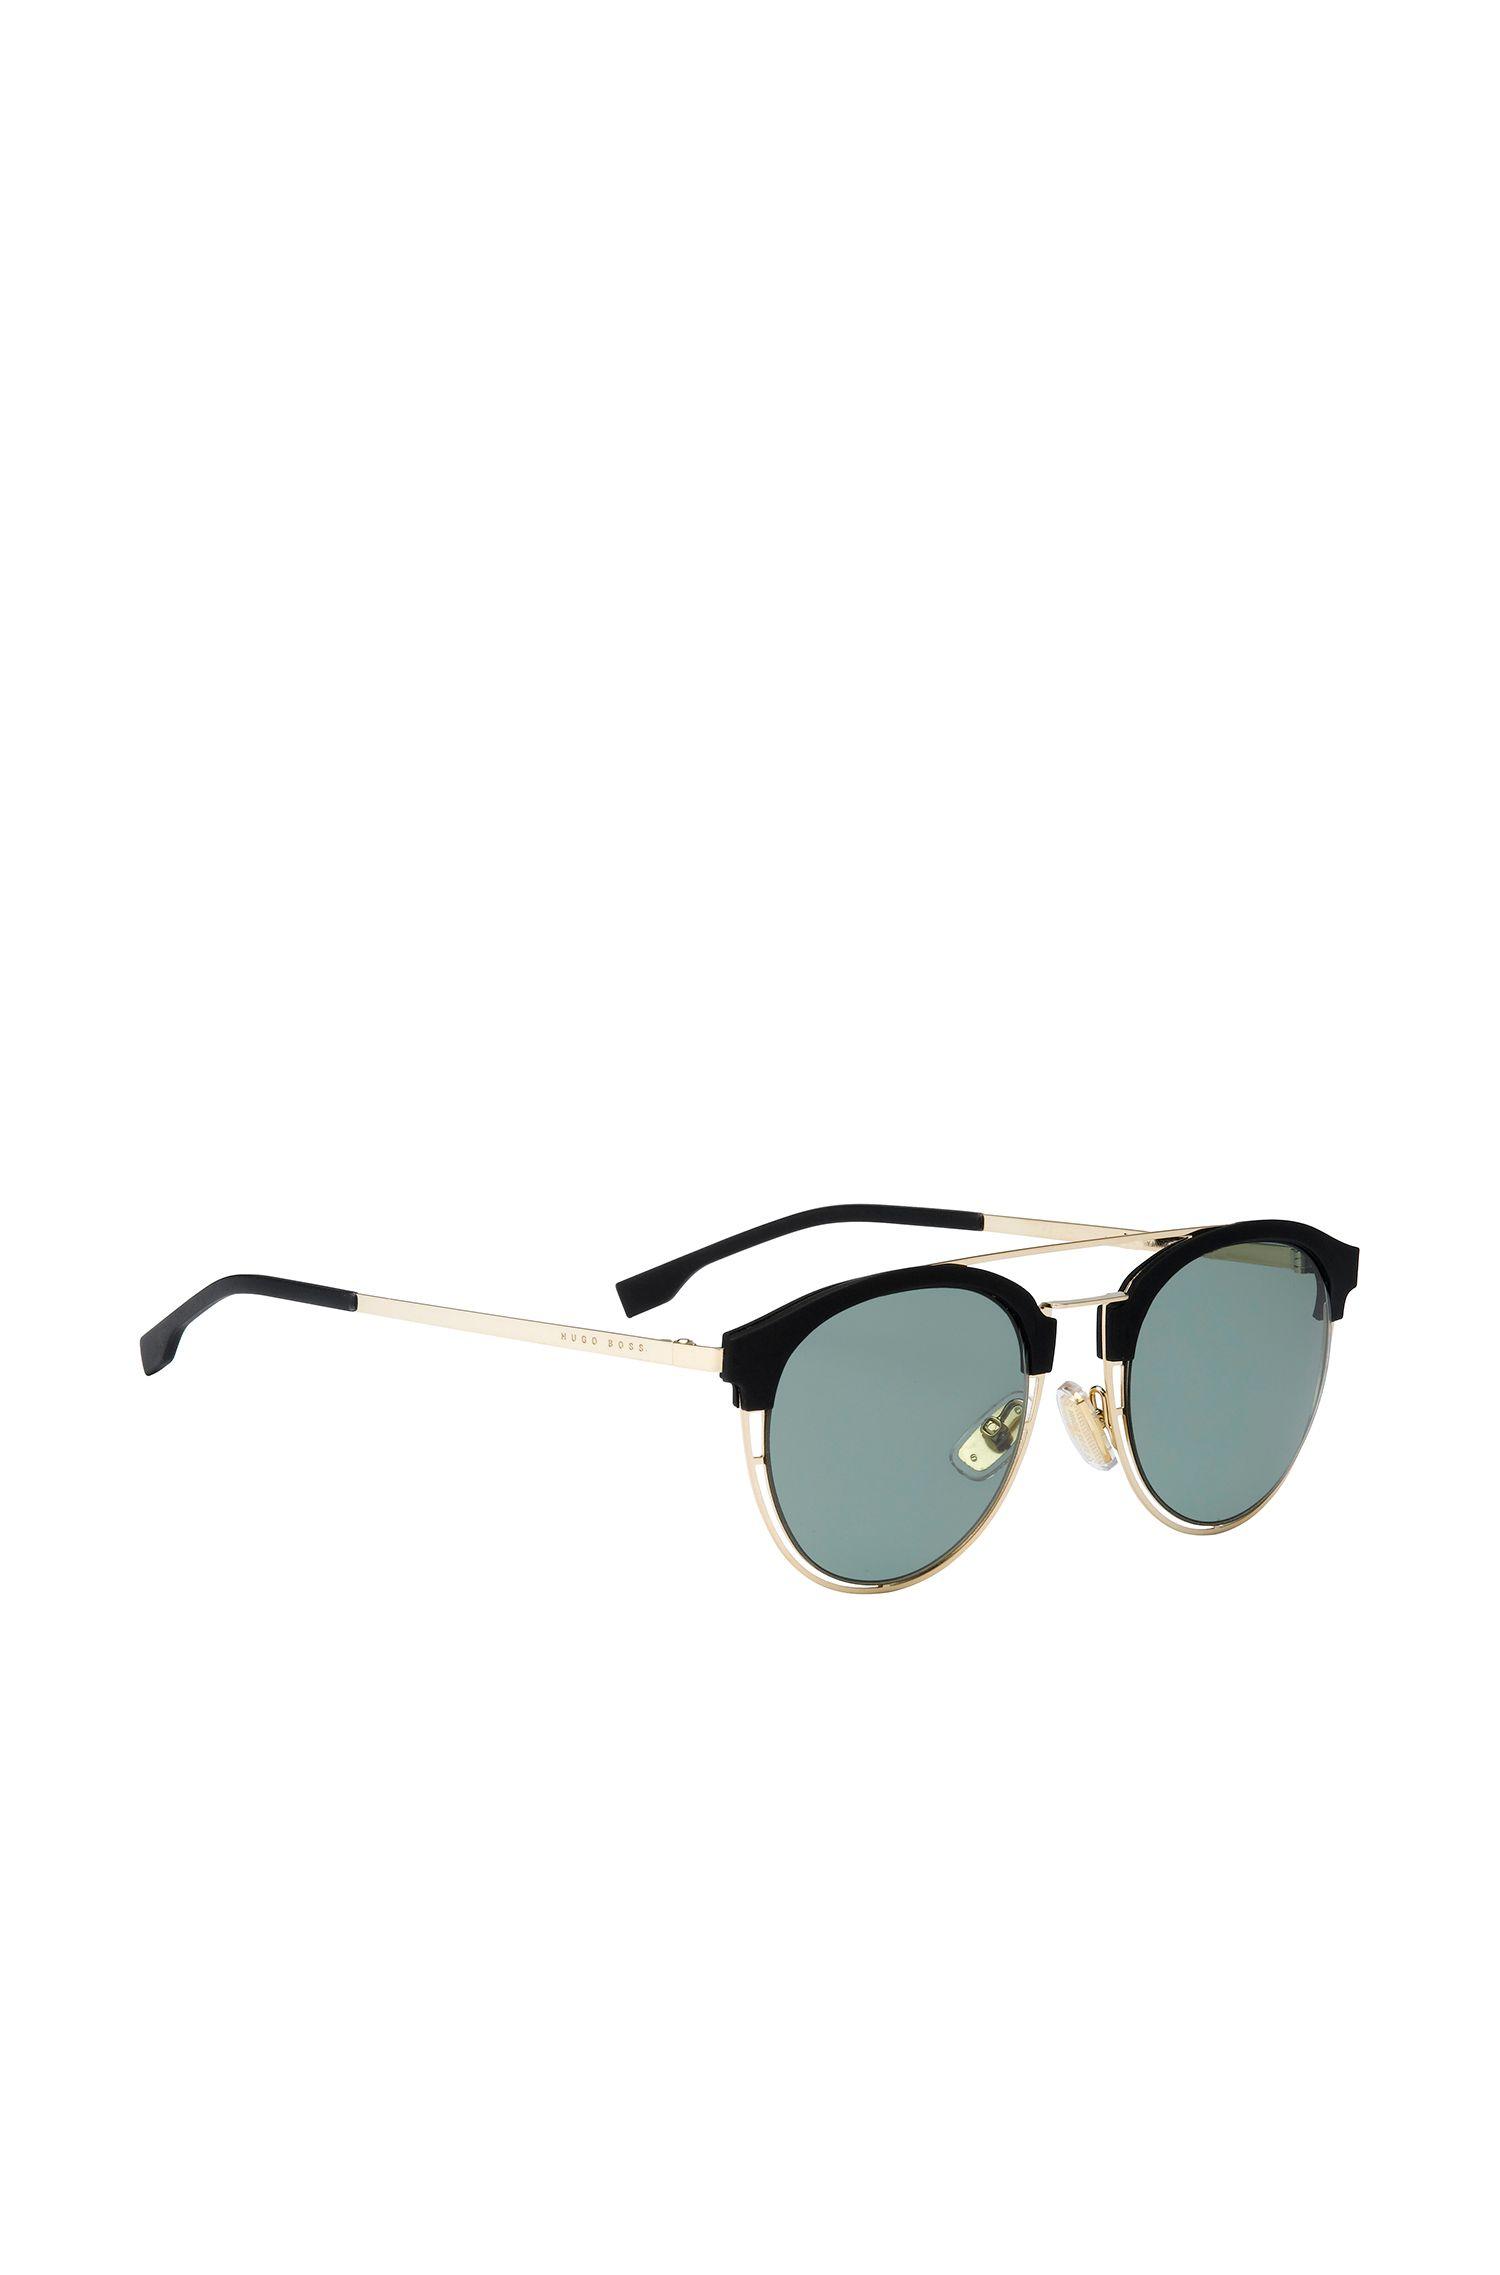 'BOSS 0784S' | Gray Green Lens Clubmaster Sunglasses